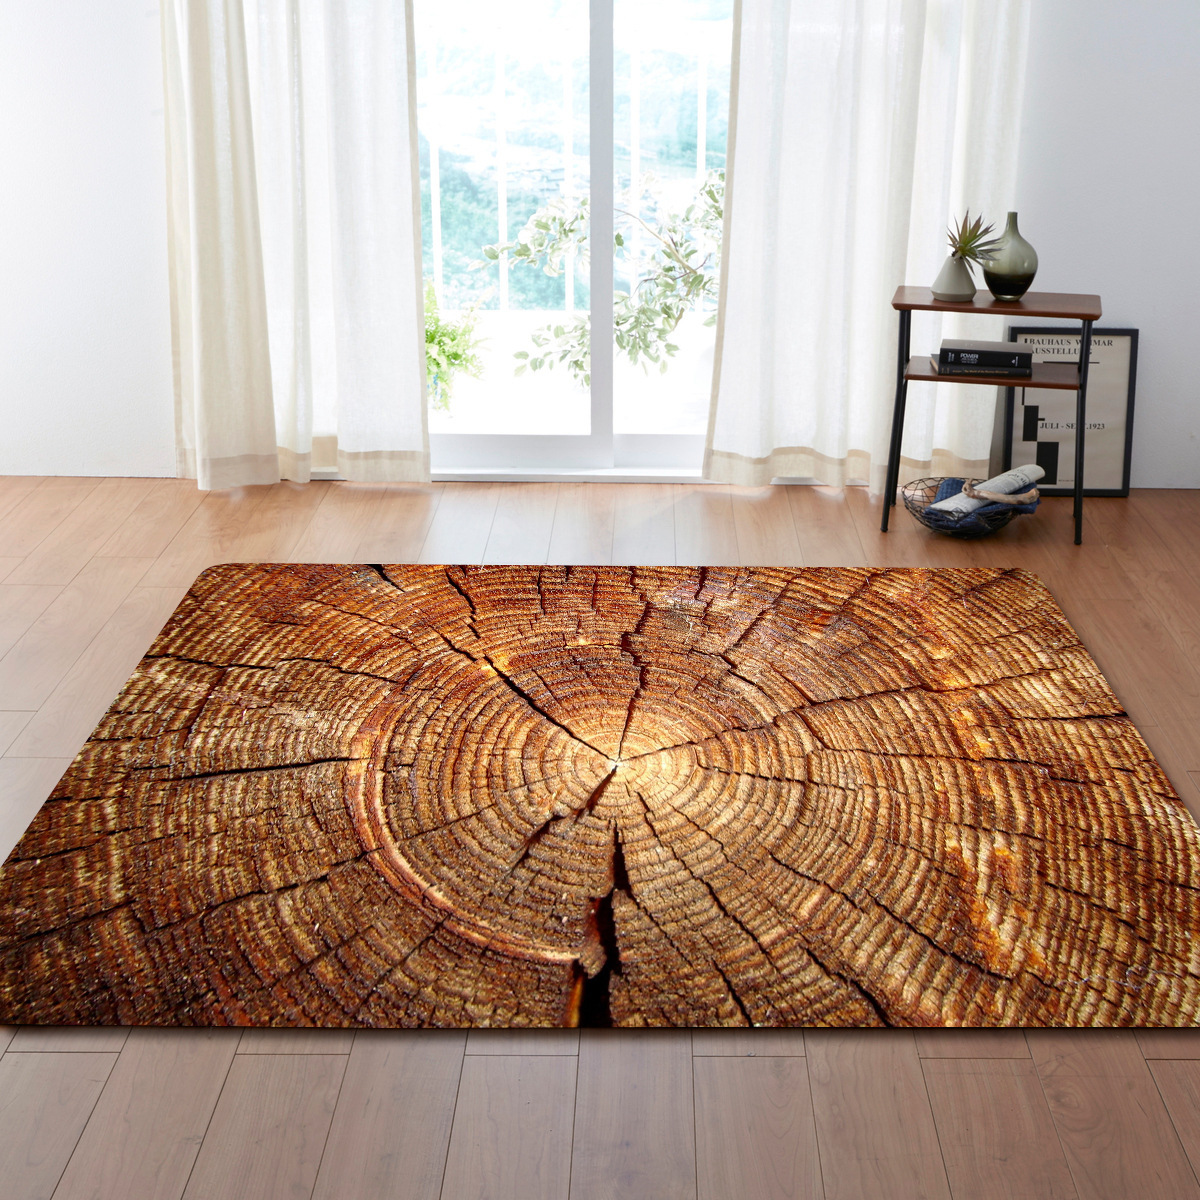 DeMissir 3D sec en bois motif impression grand tapis pour salon chambre Pad enfants payer tapis tapetes tapis tapete criativo